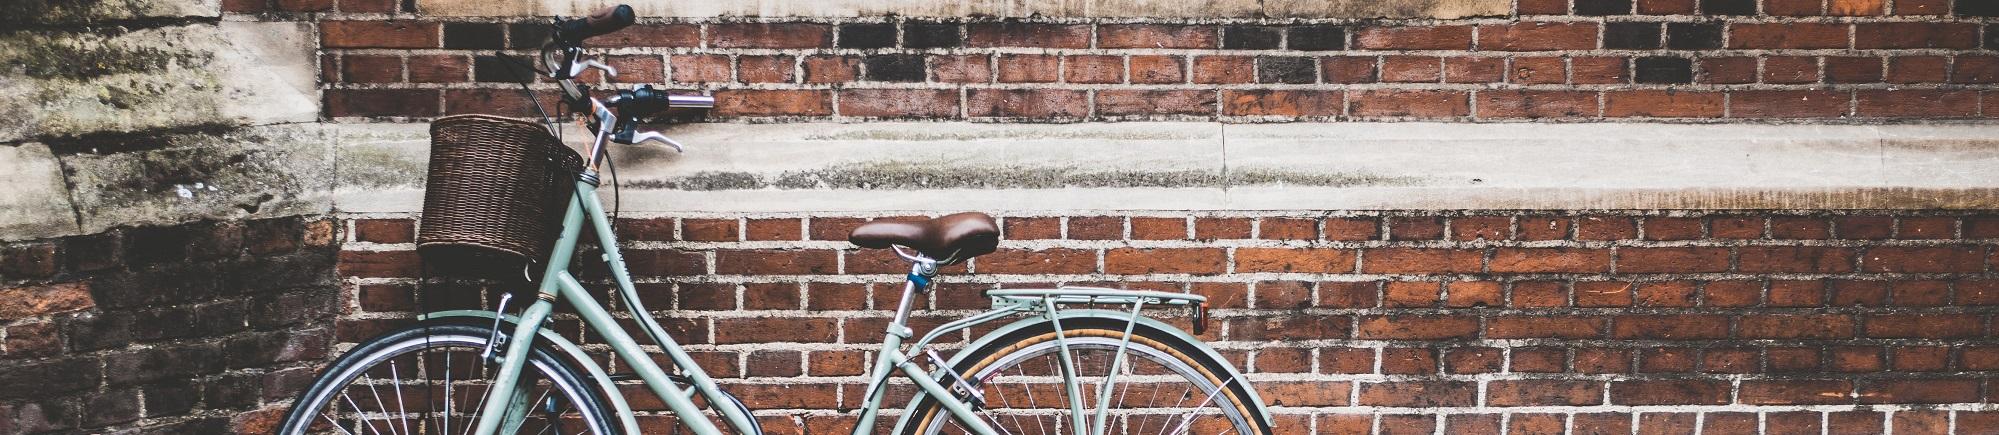 Why explore Cambridge by bike